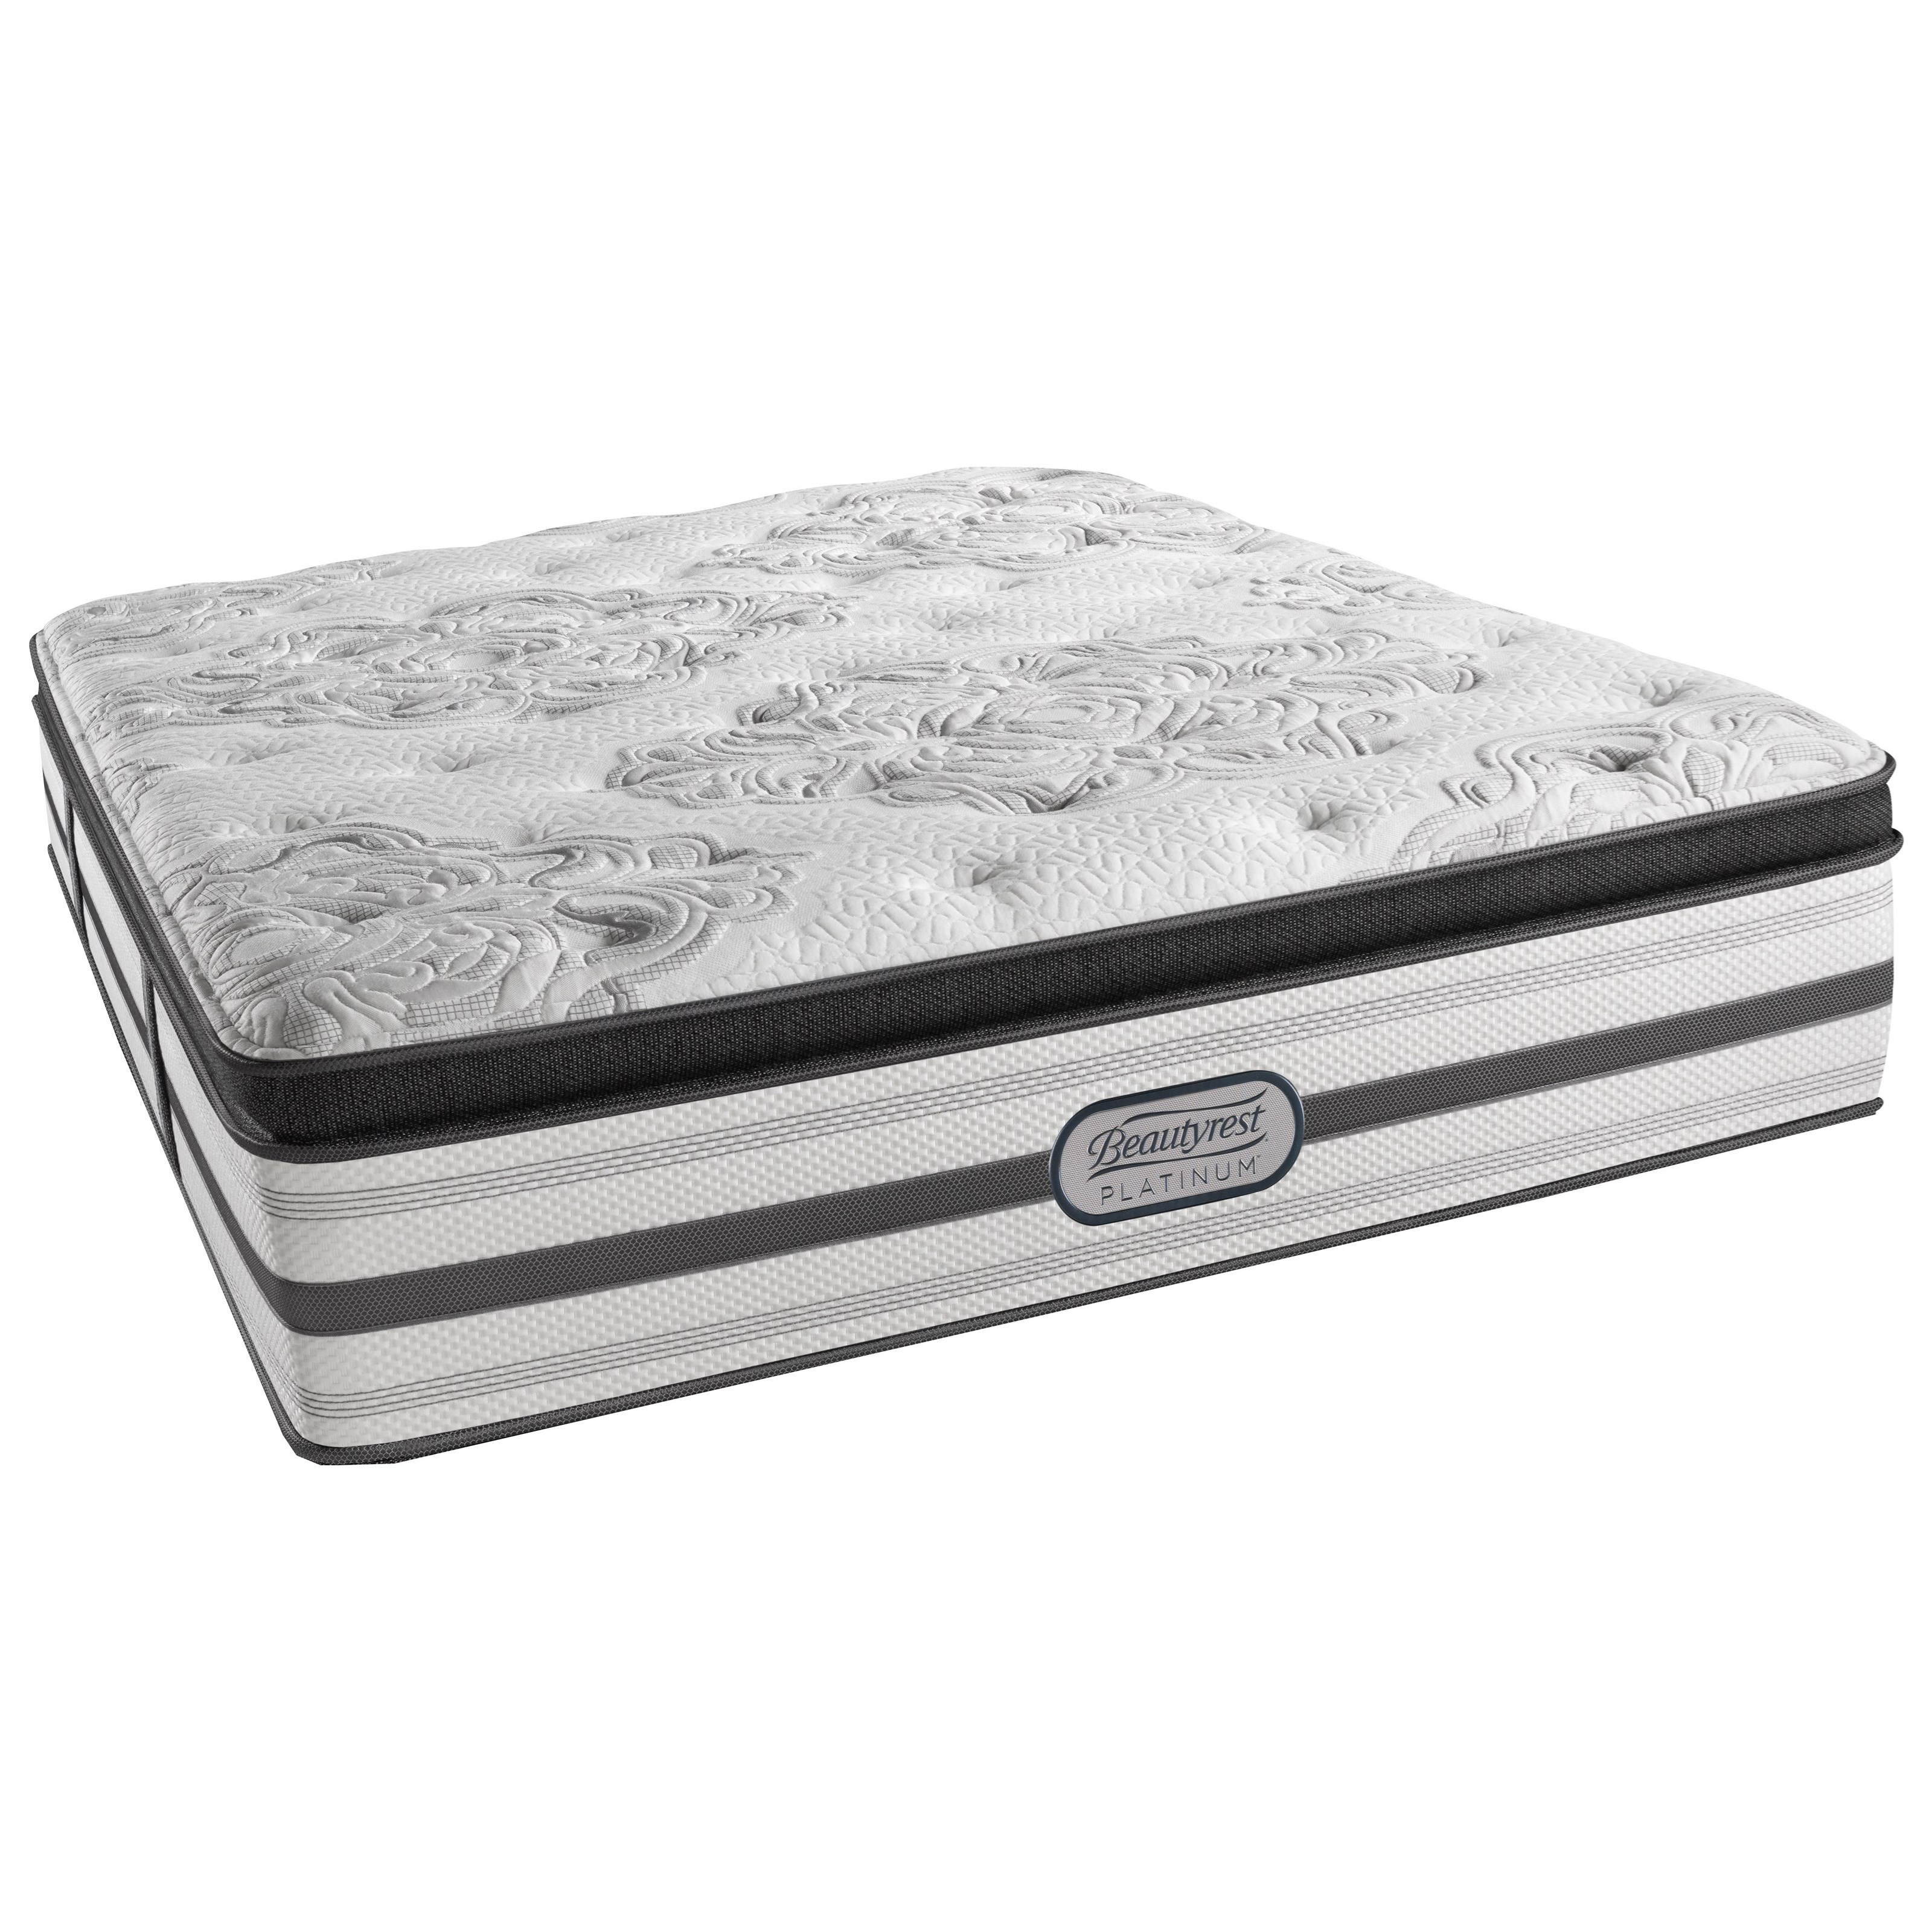 Beautyrest Platinum Gabriella Queen Plush Pillow Top Adjustable Set - Item Number: LV3PLPT-Q+SM1-Q